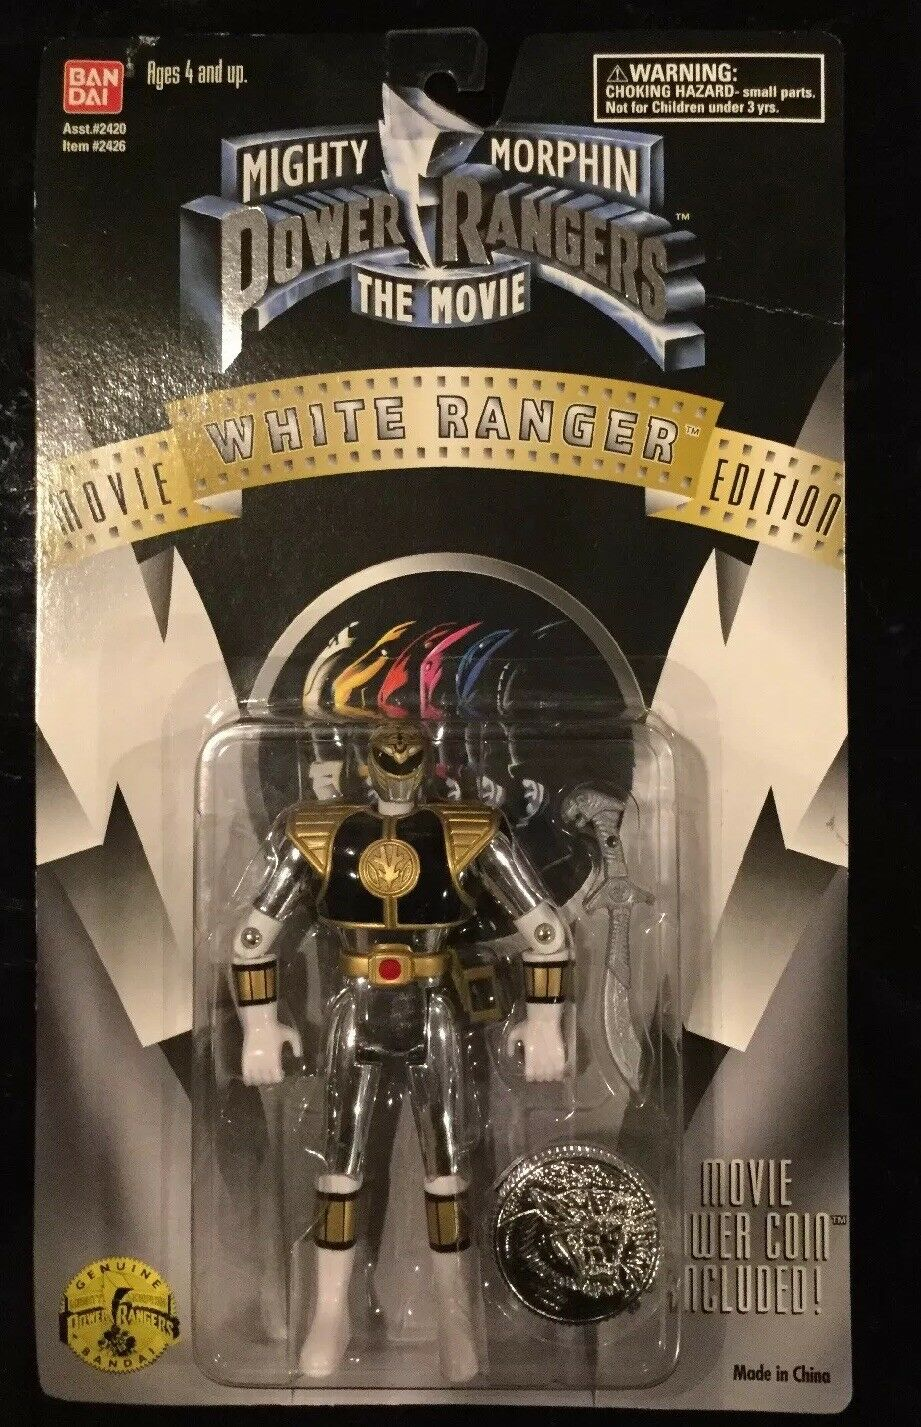 Mächtige morphin power rangers den film  Weiß 5 - fabrik versiegelt, 1995